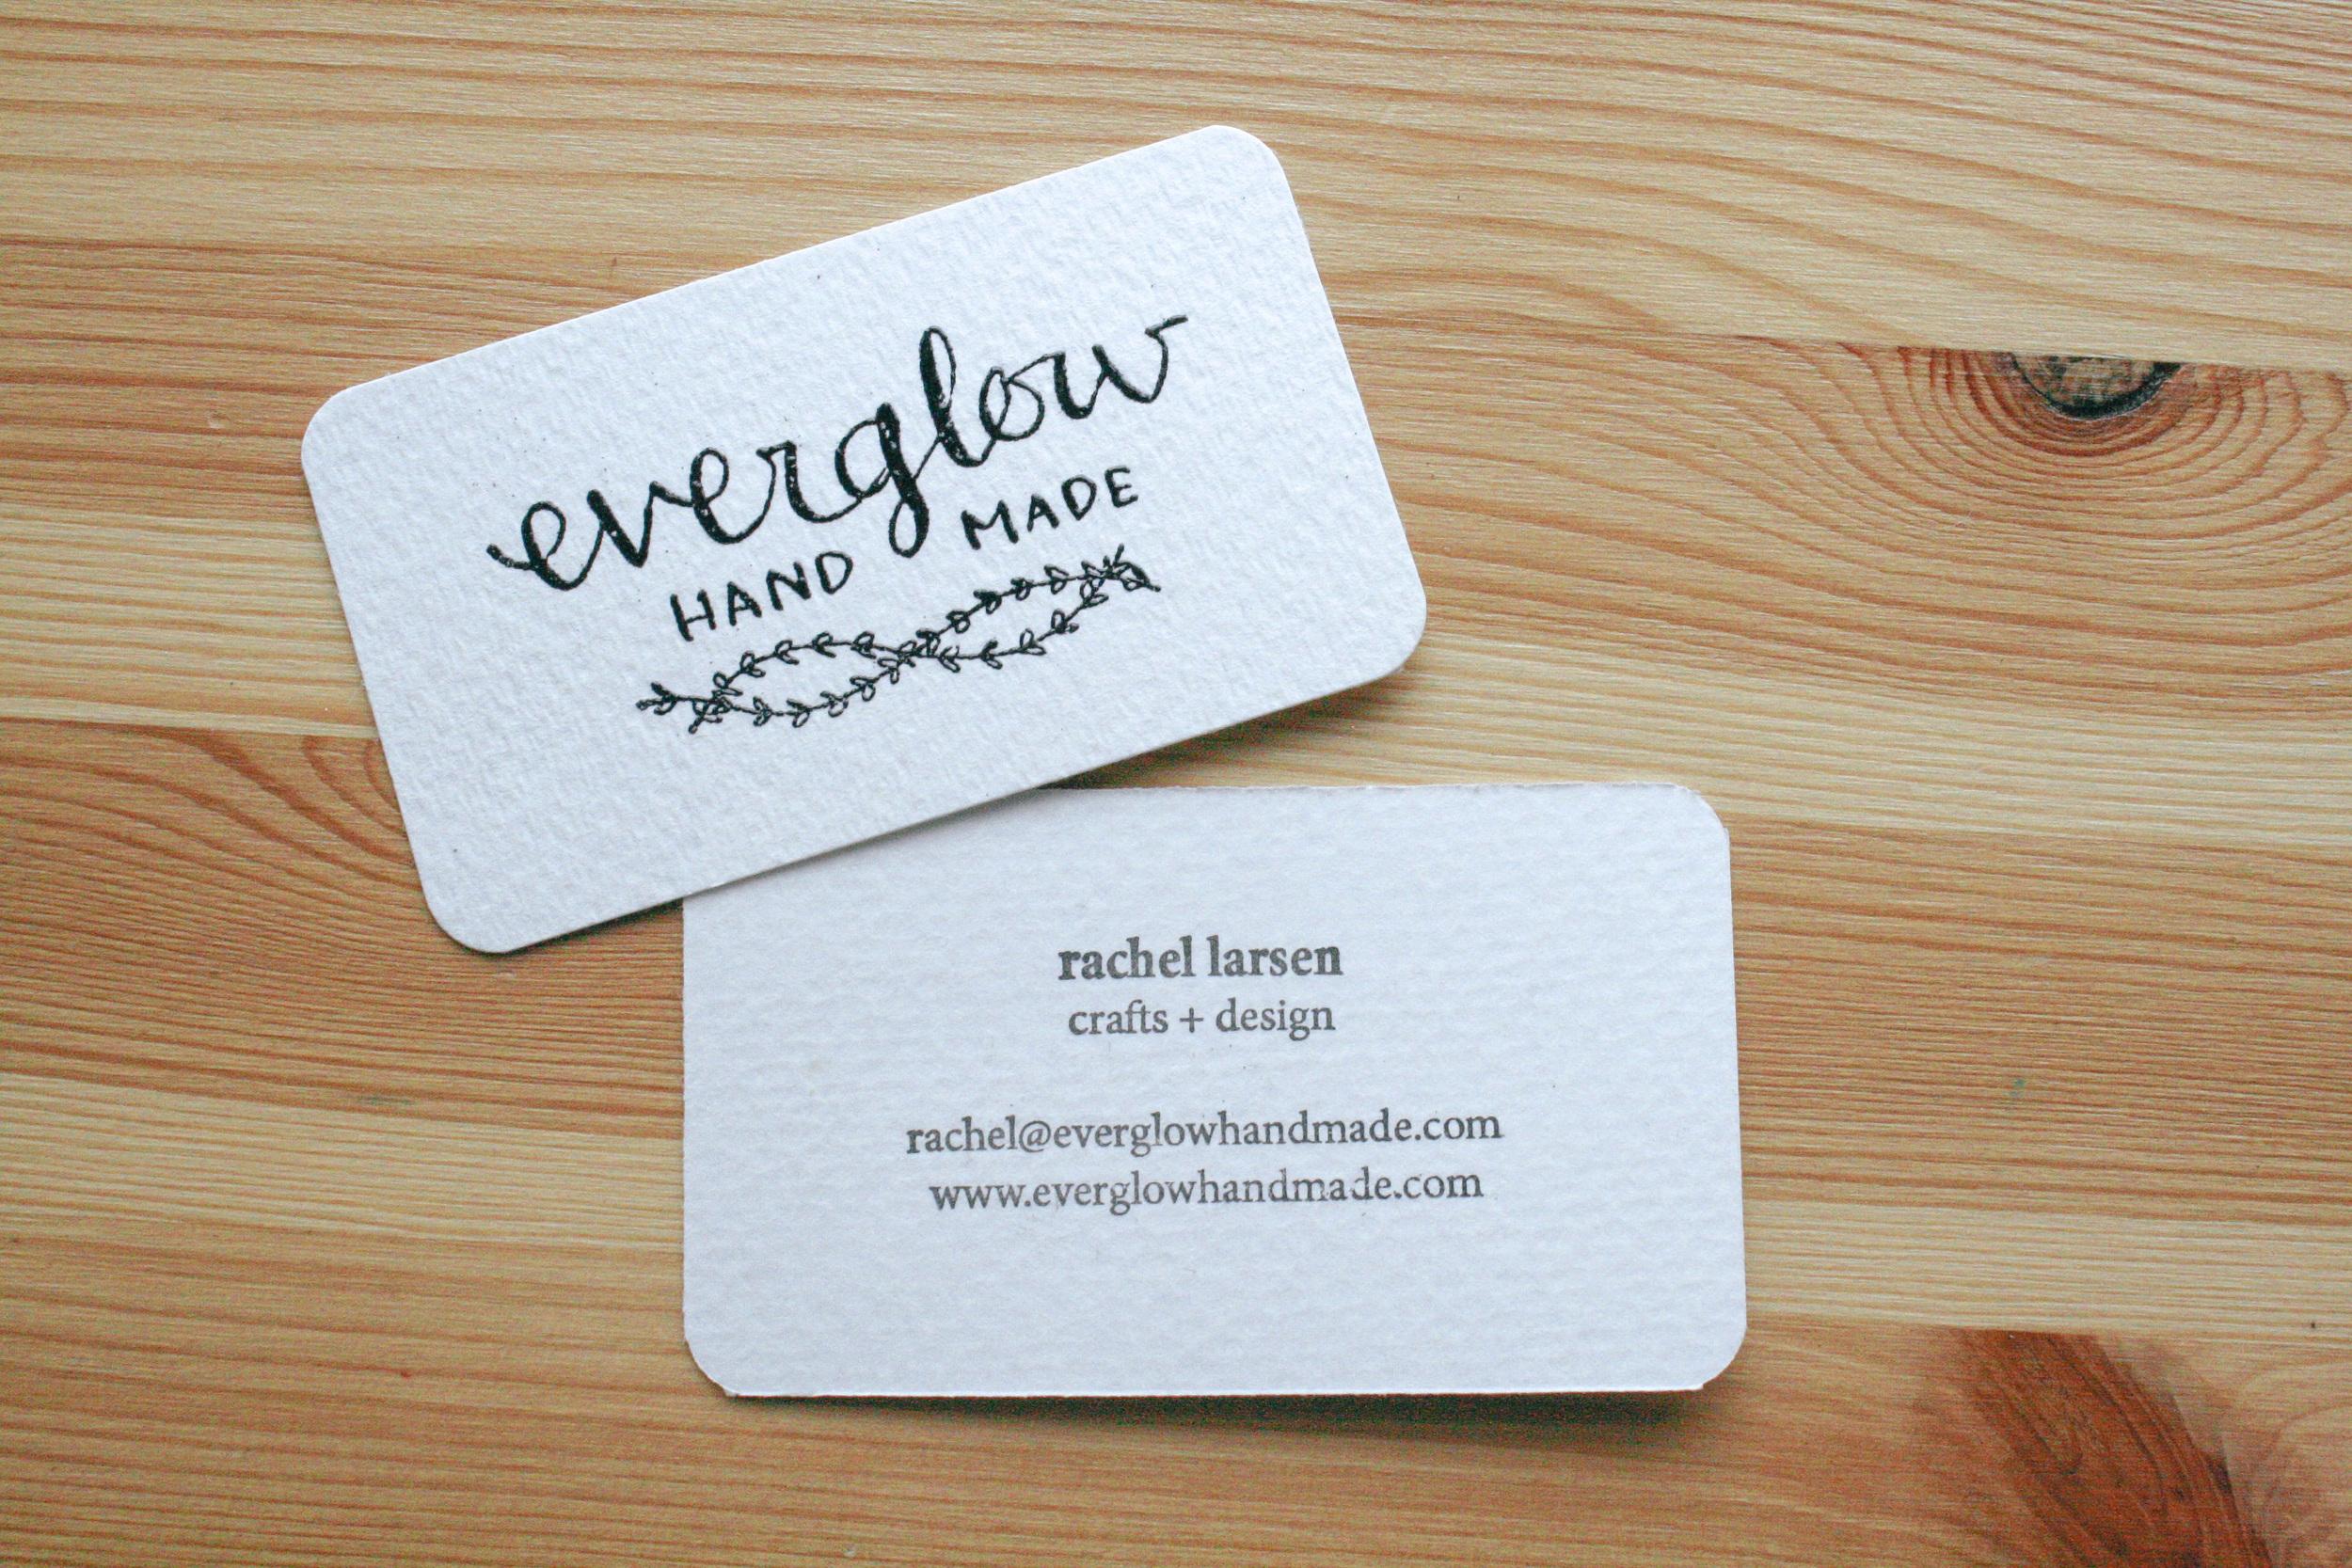 everglow handmade business cards embossed custom made